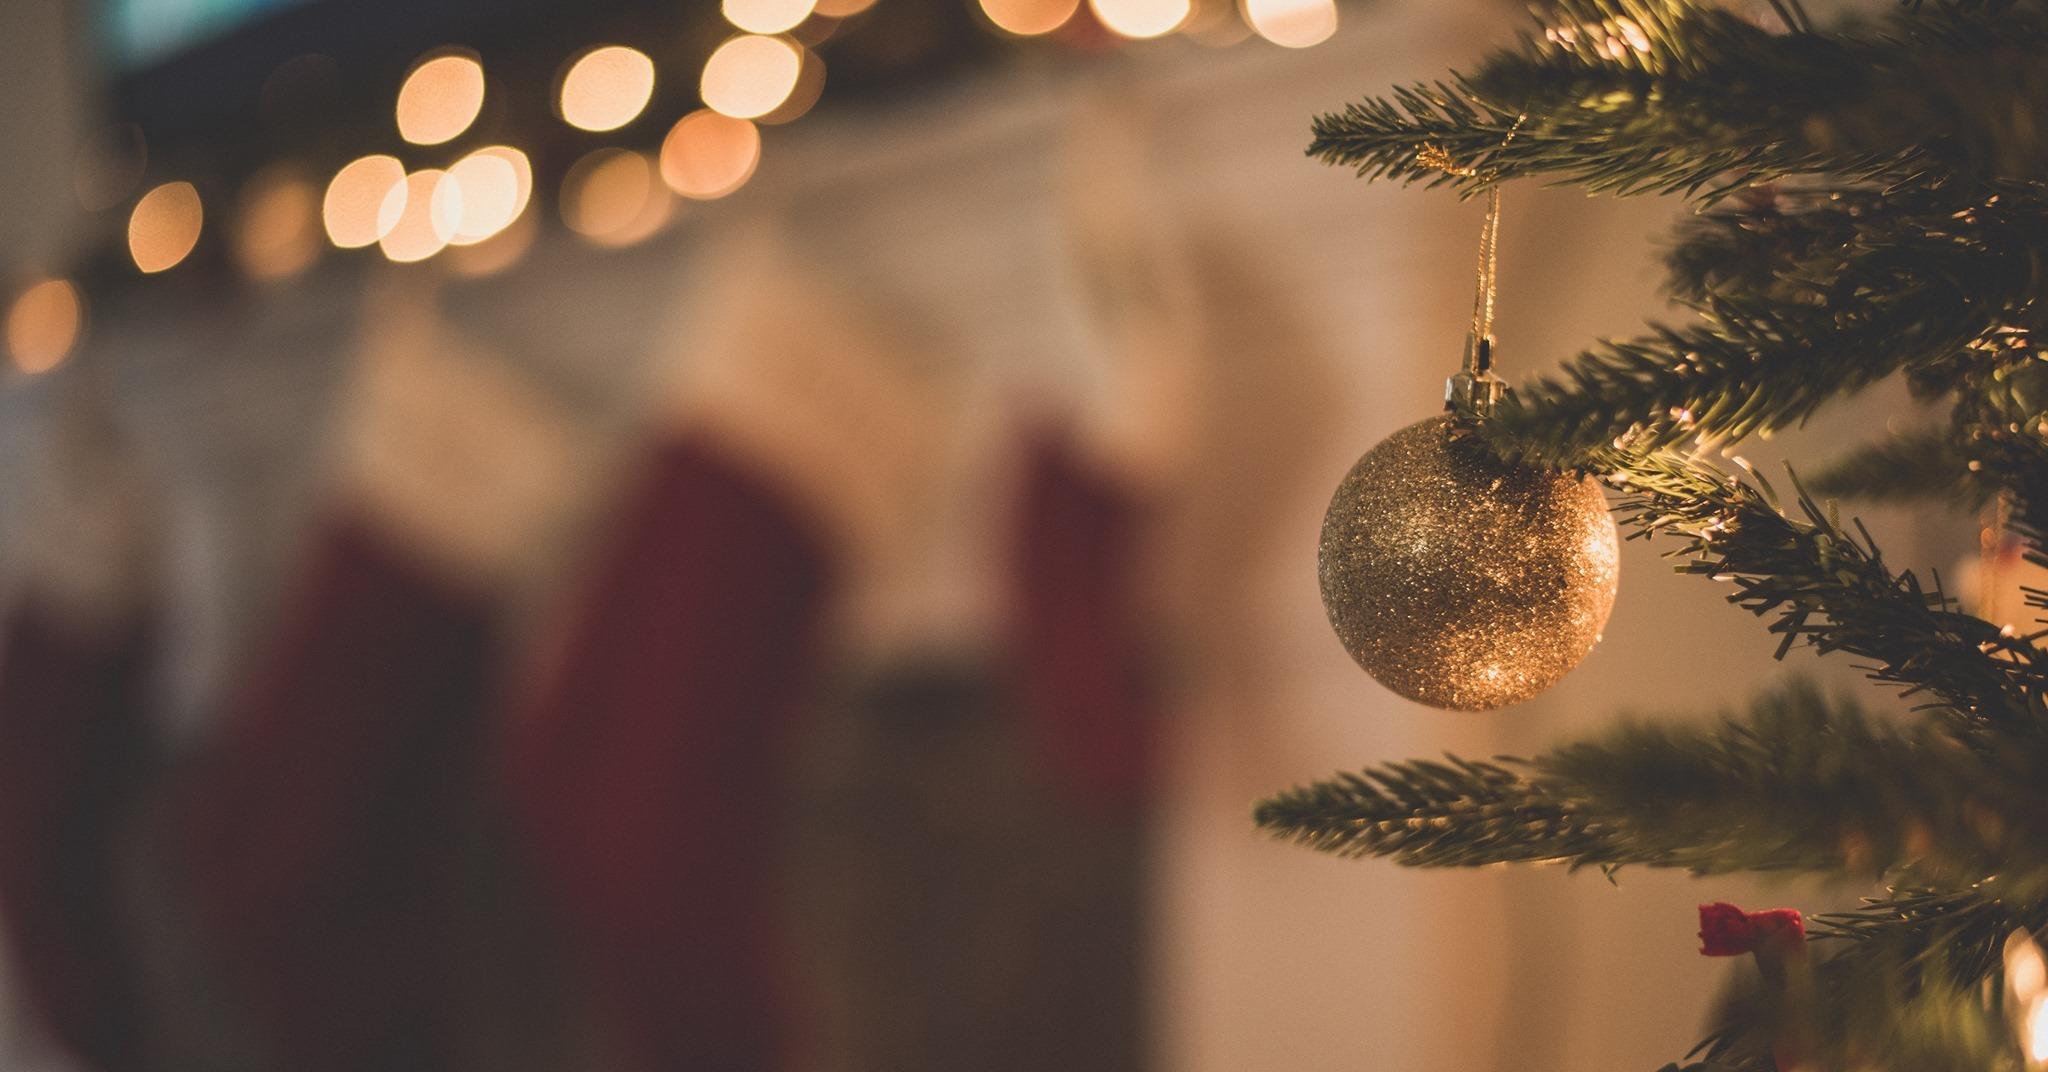 Merry Christmas! ✨🎄🎅